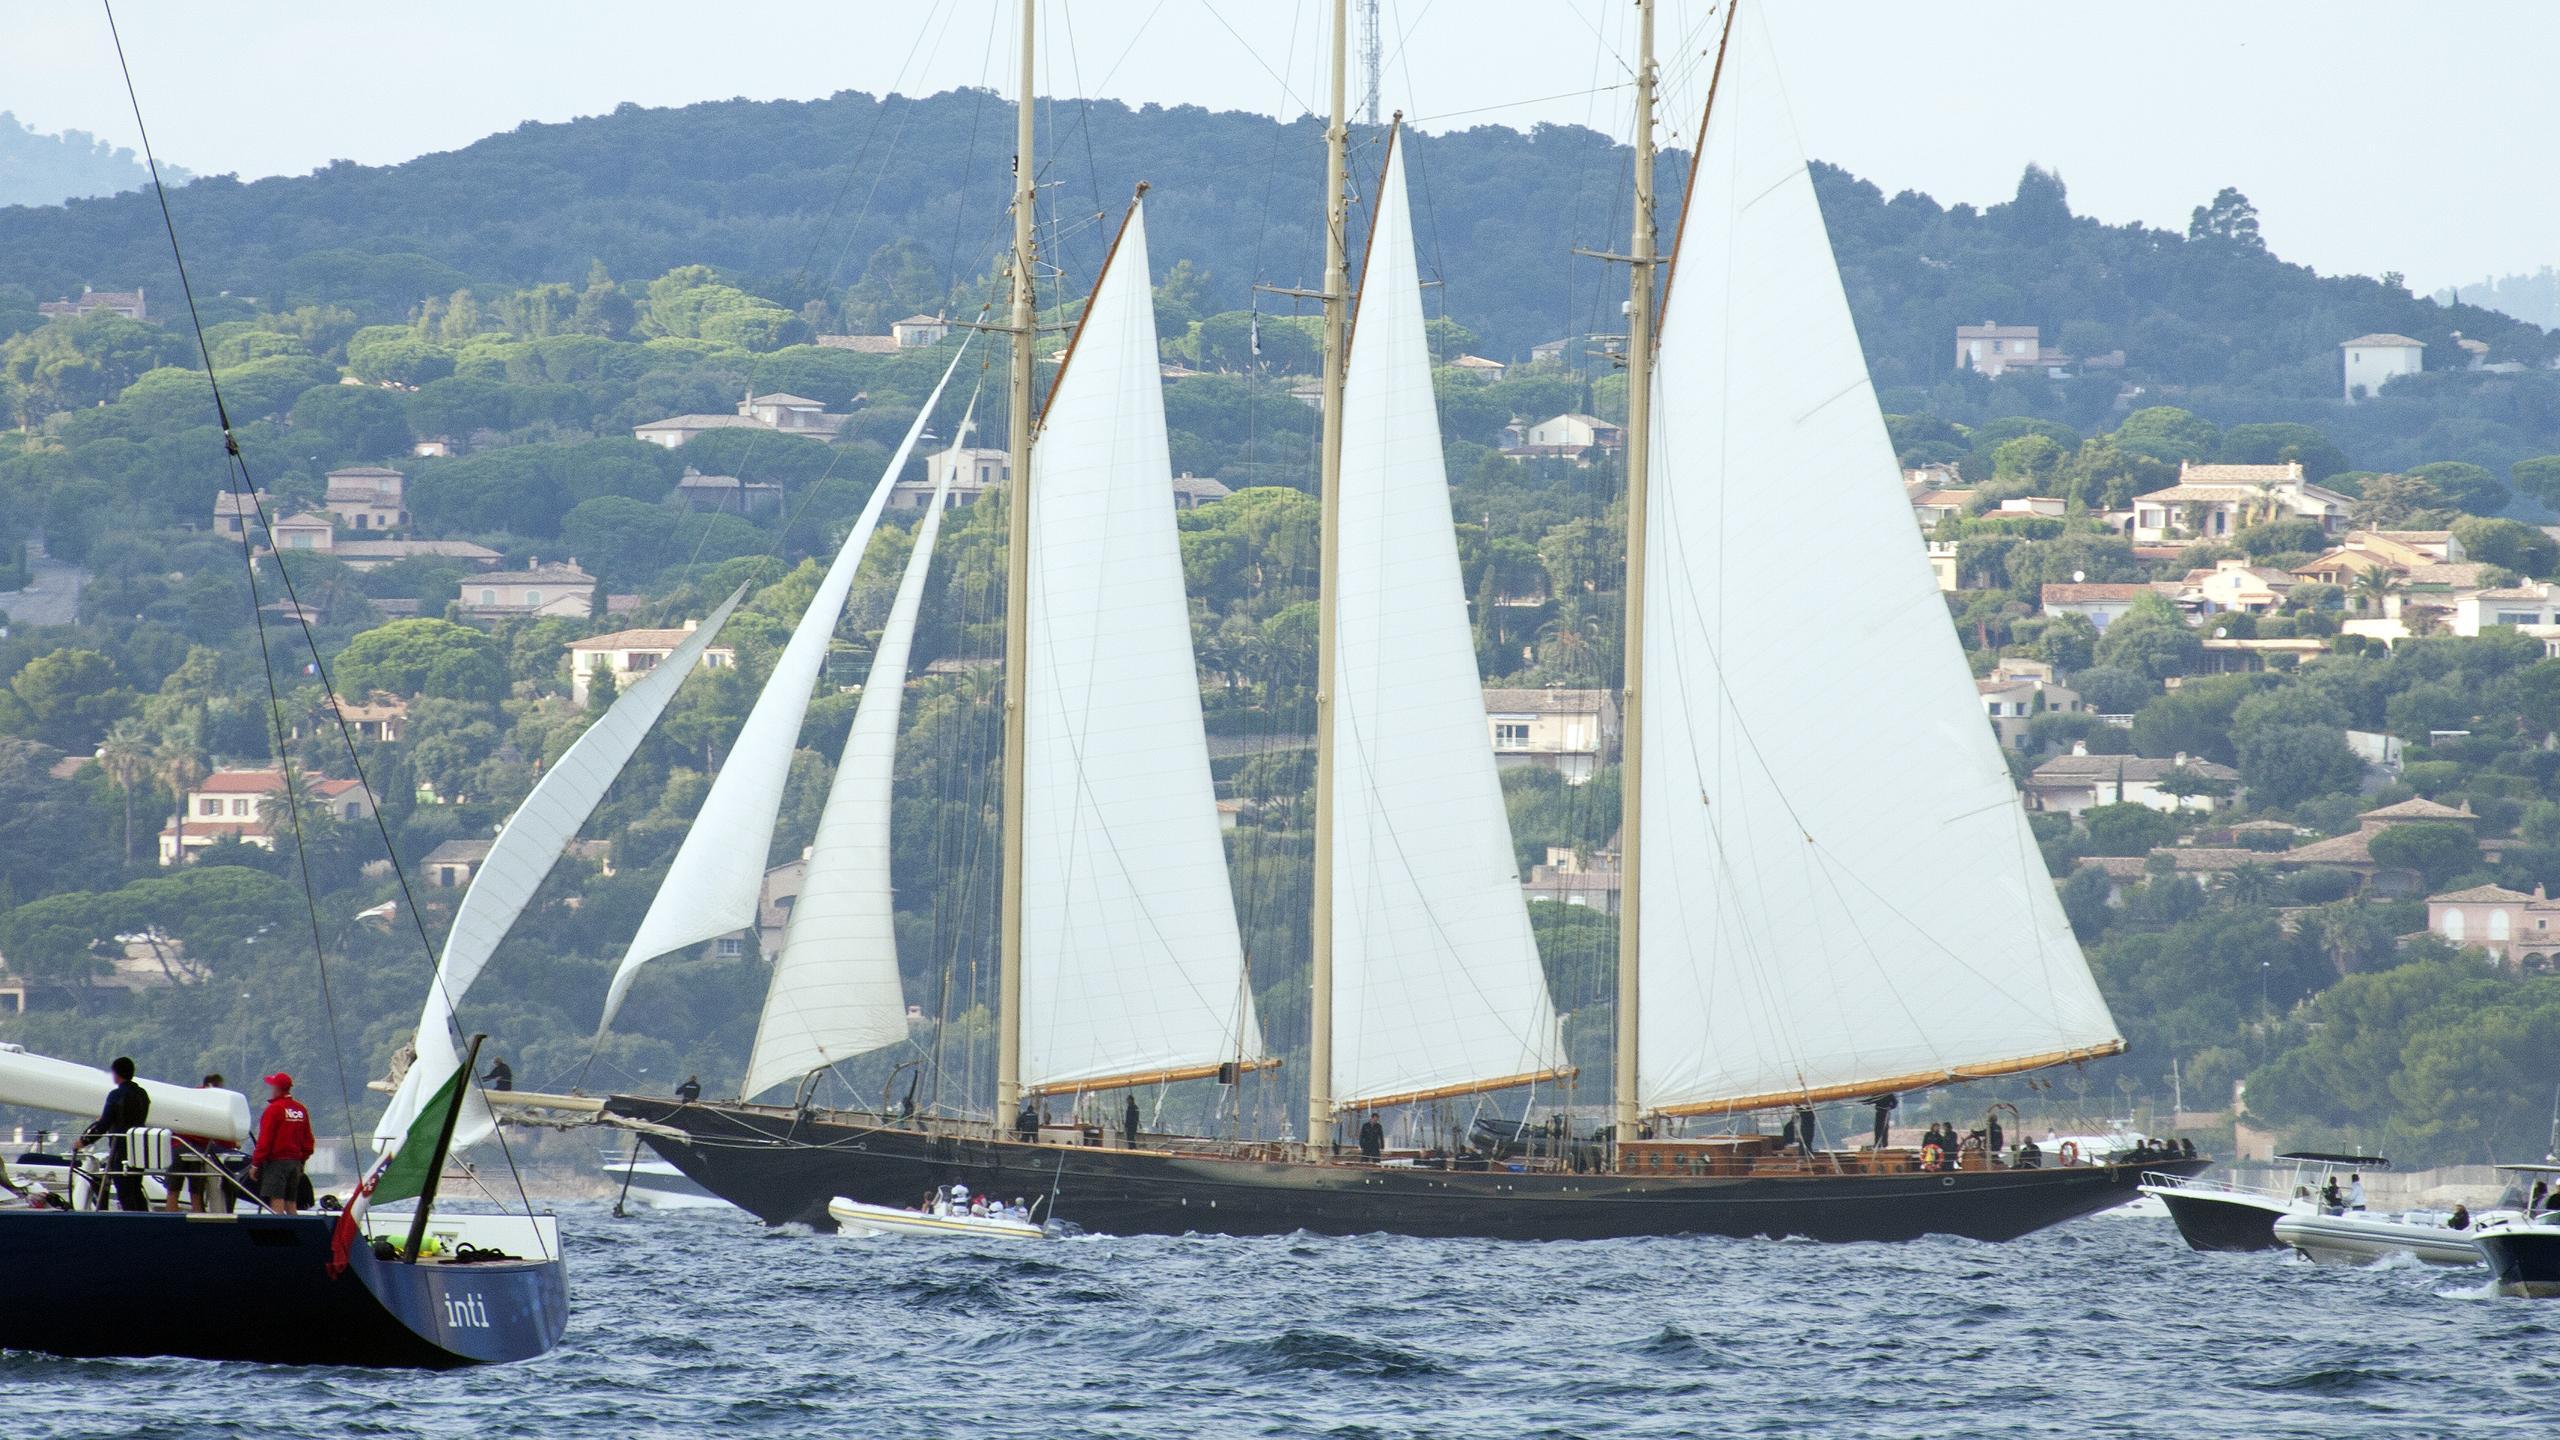 atlantic-sailing-yacht-graafship-2010-69m-running